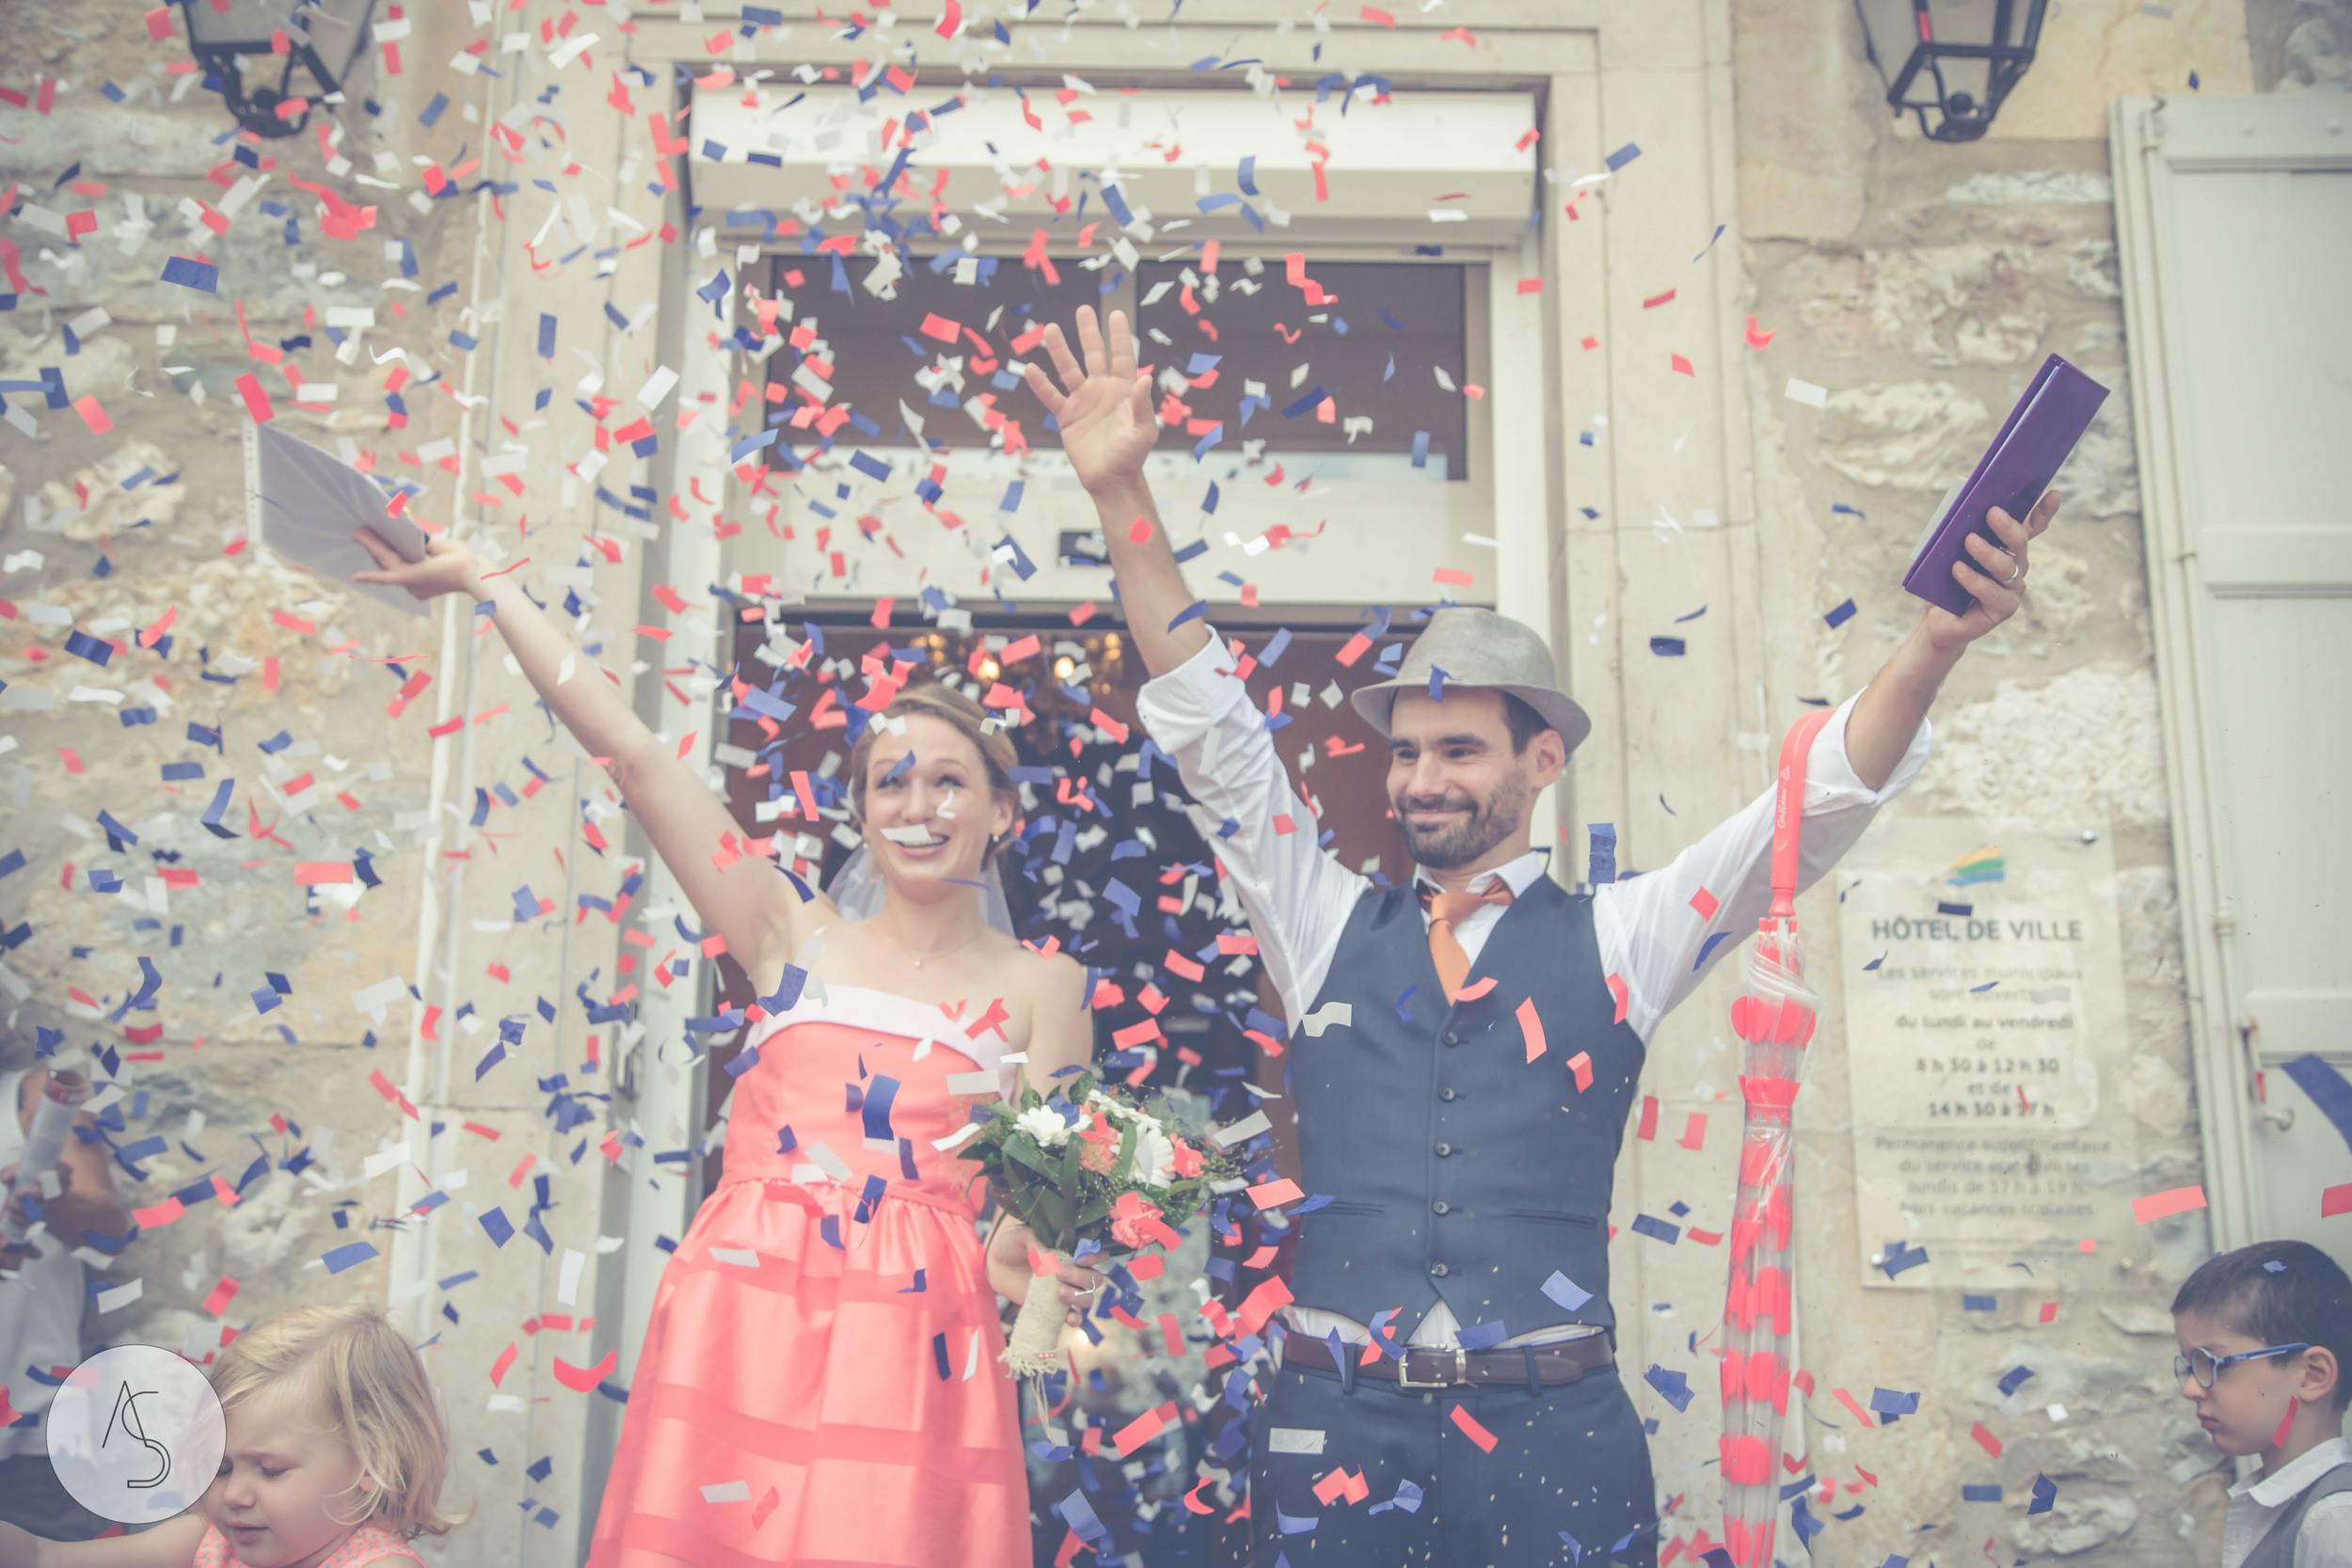 photographe mariage - Grenoble - Rhone Alpes - Adriana Salazar photo-80.jpg